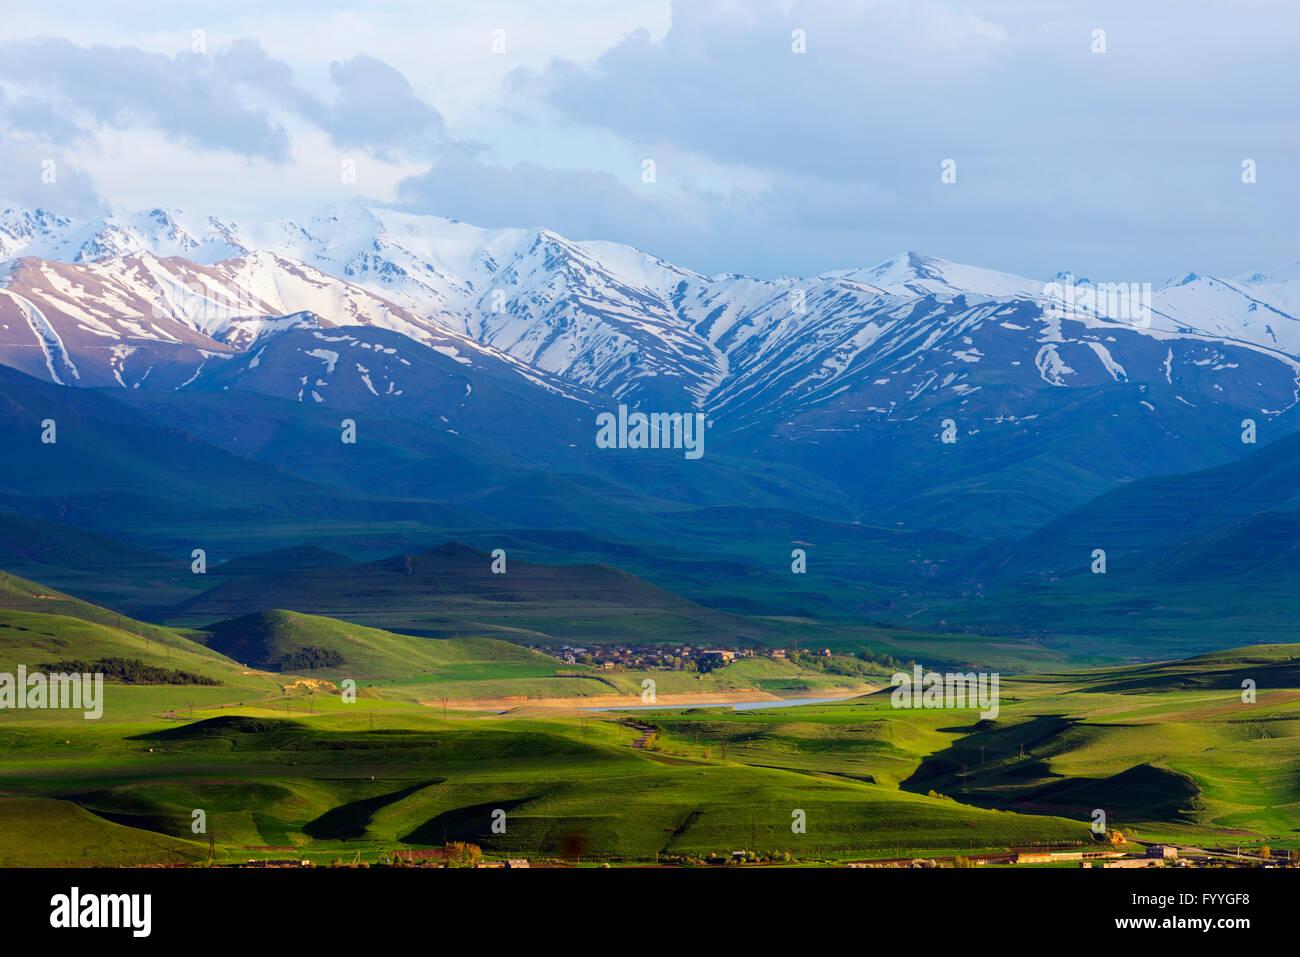 Eurasia, Caucasus region, Armenia, Syunik province, scenery near Sisian - Stock Image